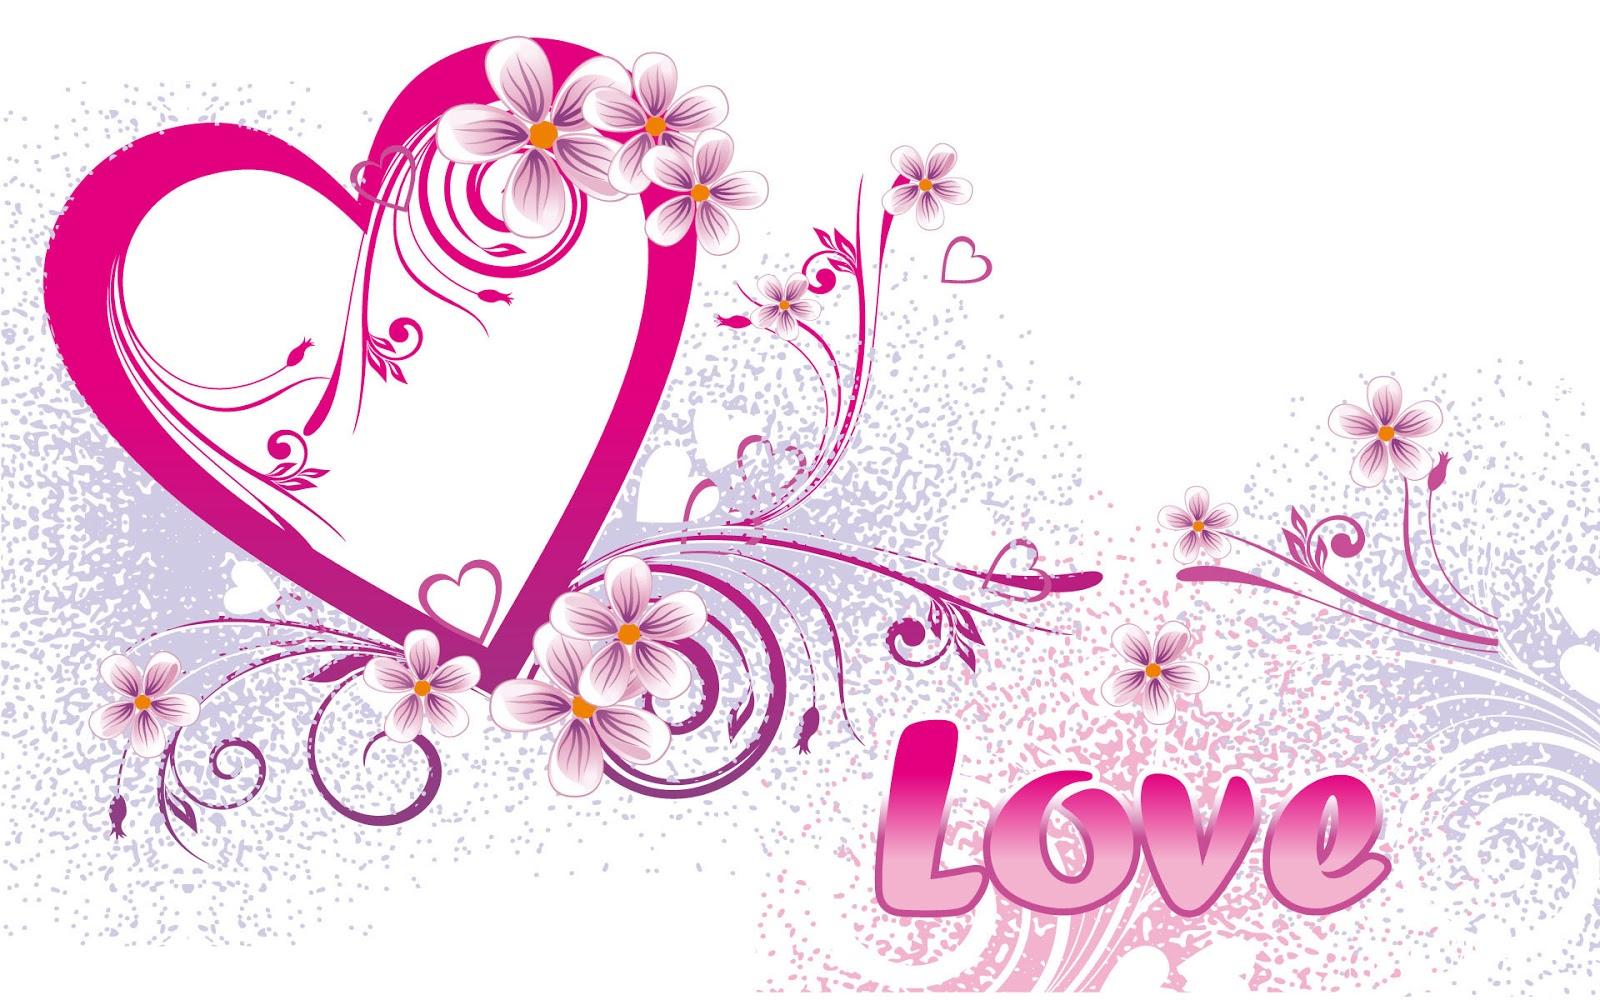 Popular Wallpaper Love Message - Love-wallpaper-love-4187632-1920-1200  Collection_23488.jpg